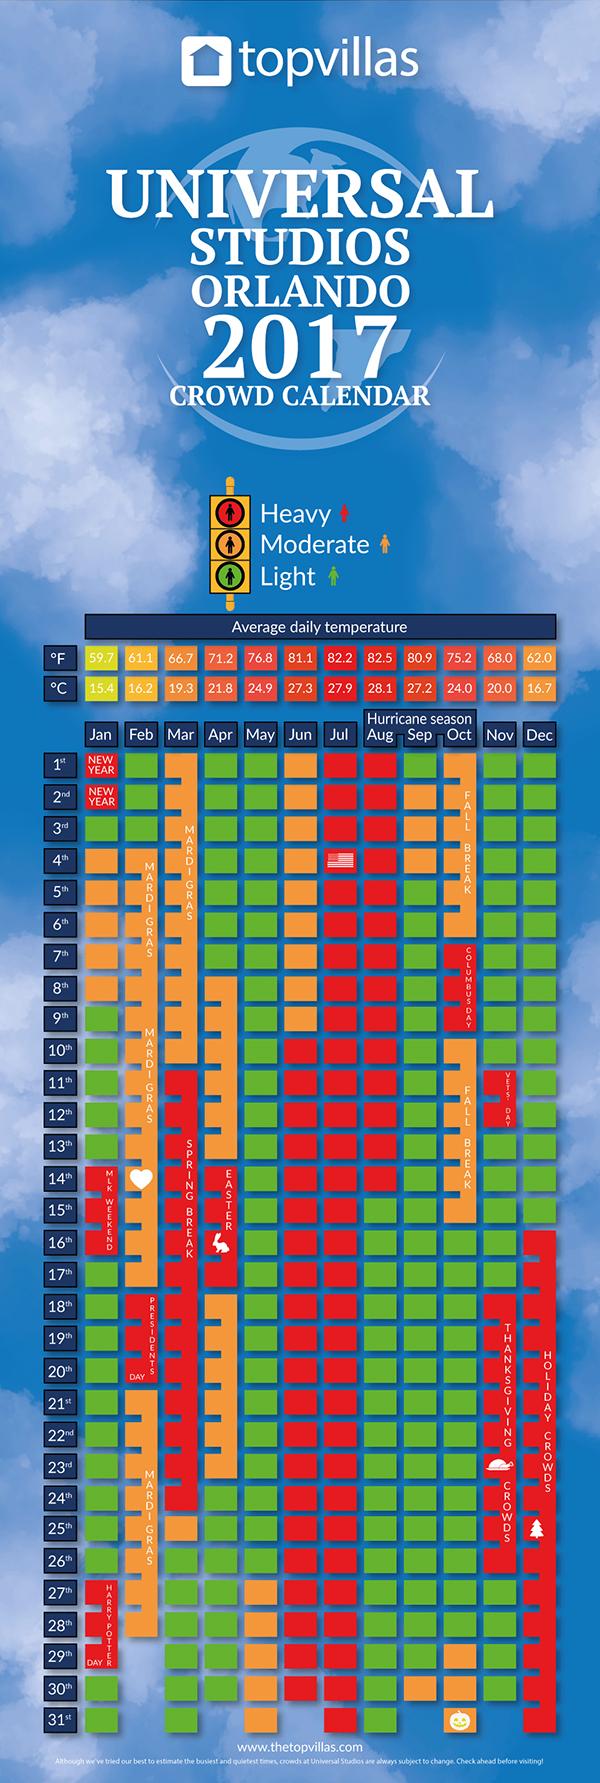 Universal Studios Crowd Calendar 2022.Universal Studios Crowd Calendar Top Villas